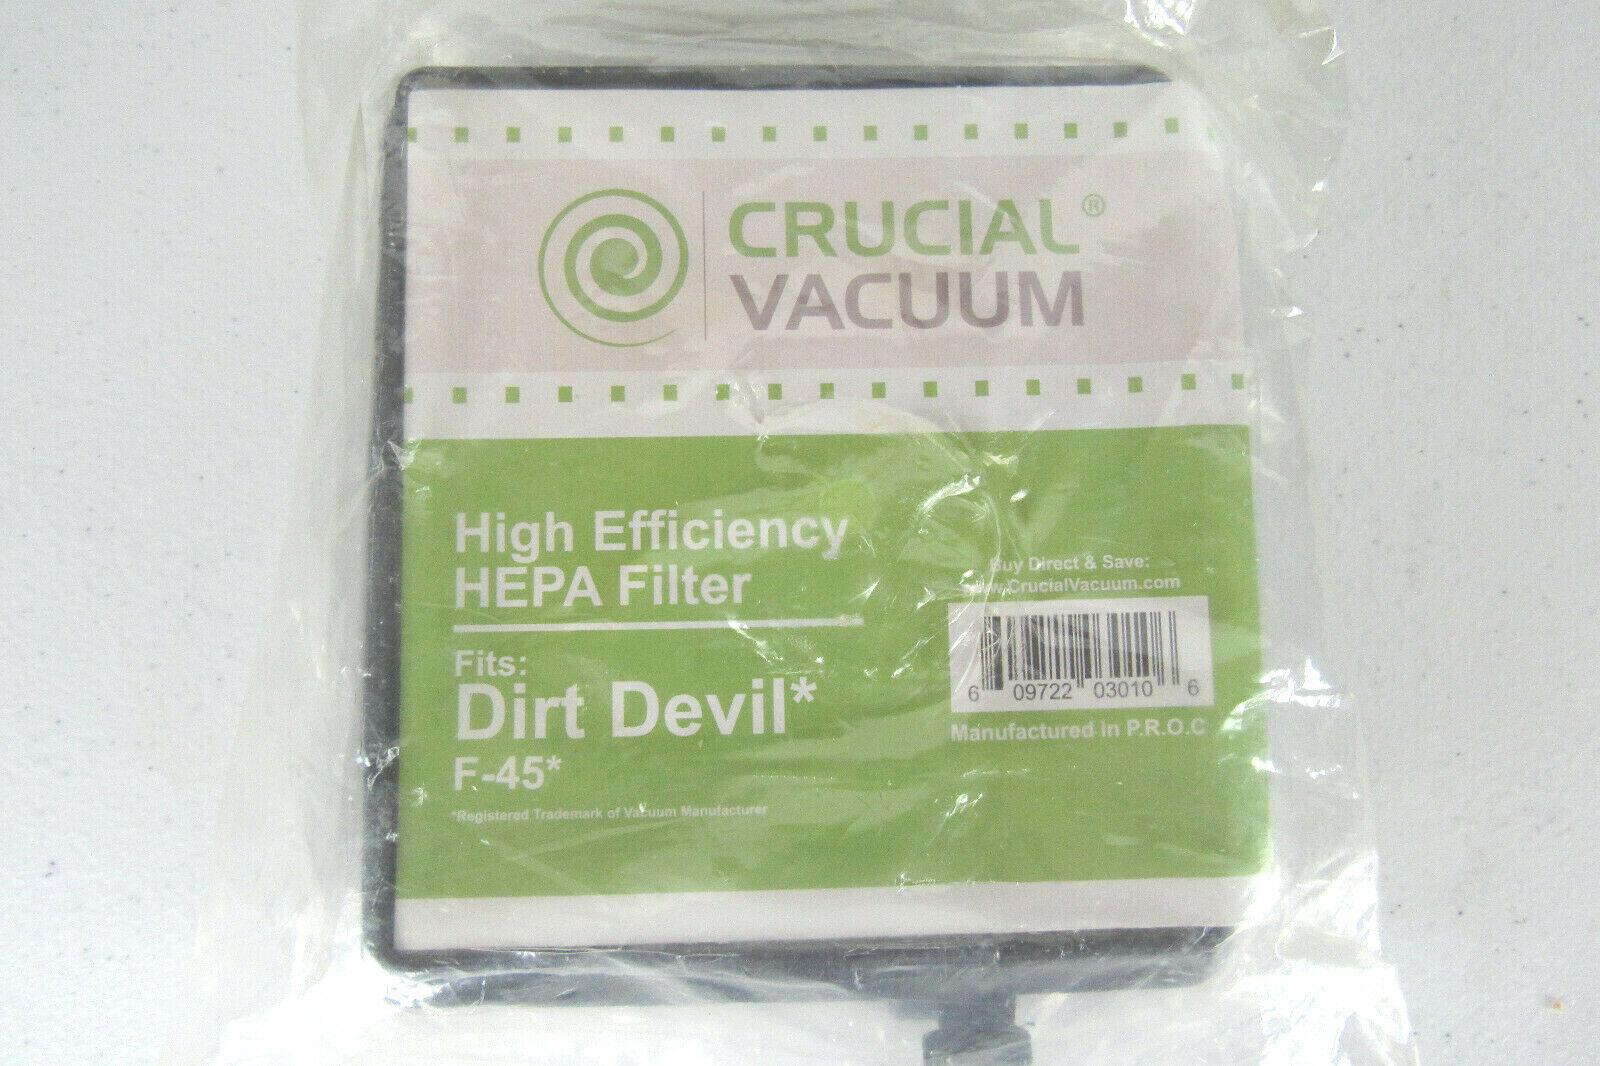 Dirt Devil F45 Canister Filter, Part # 2KQ0107000